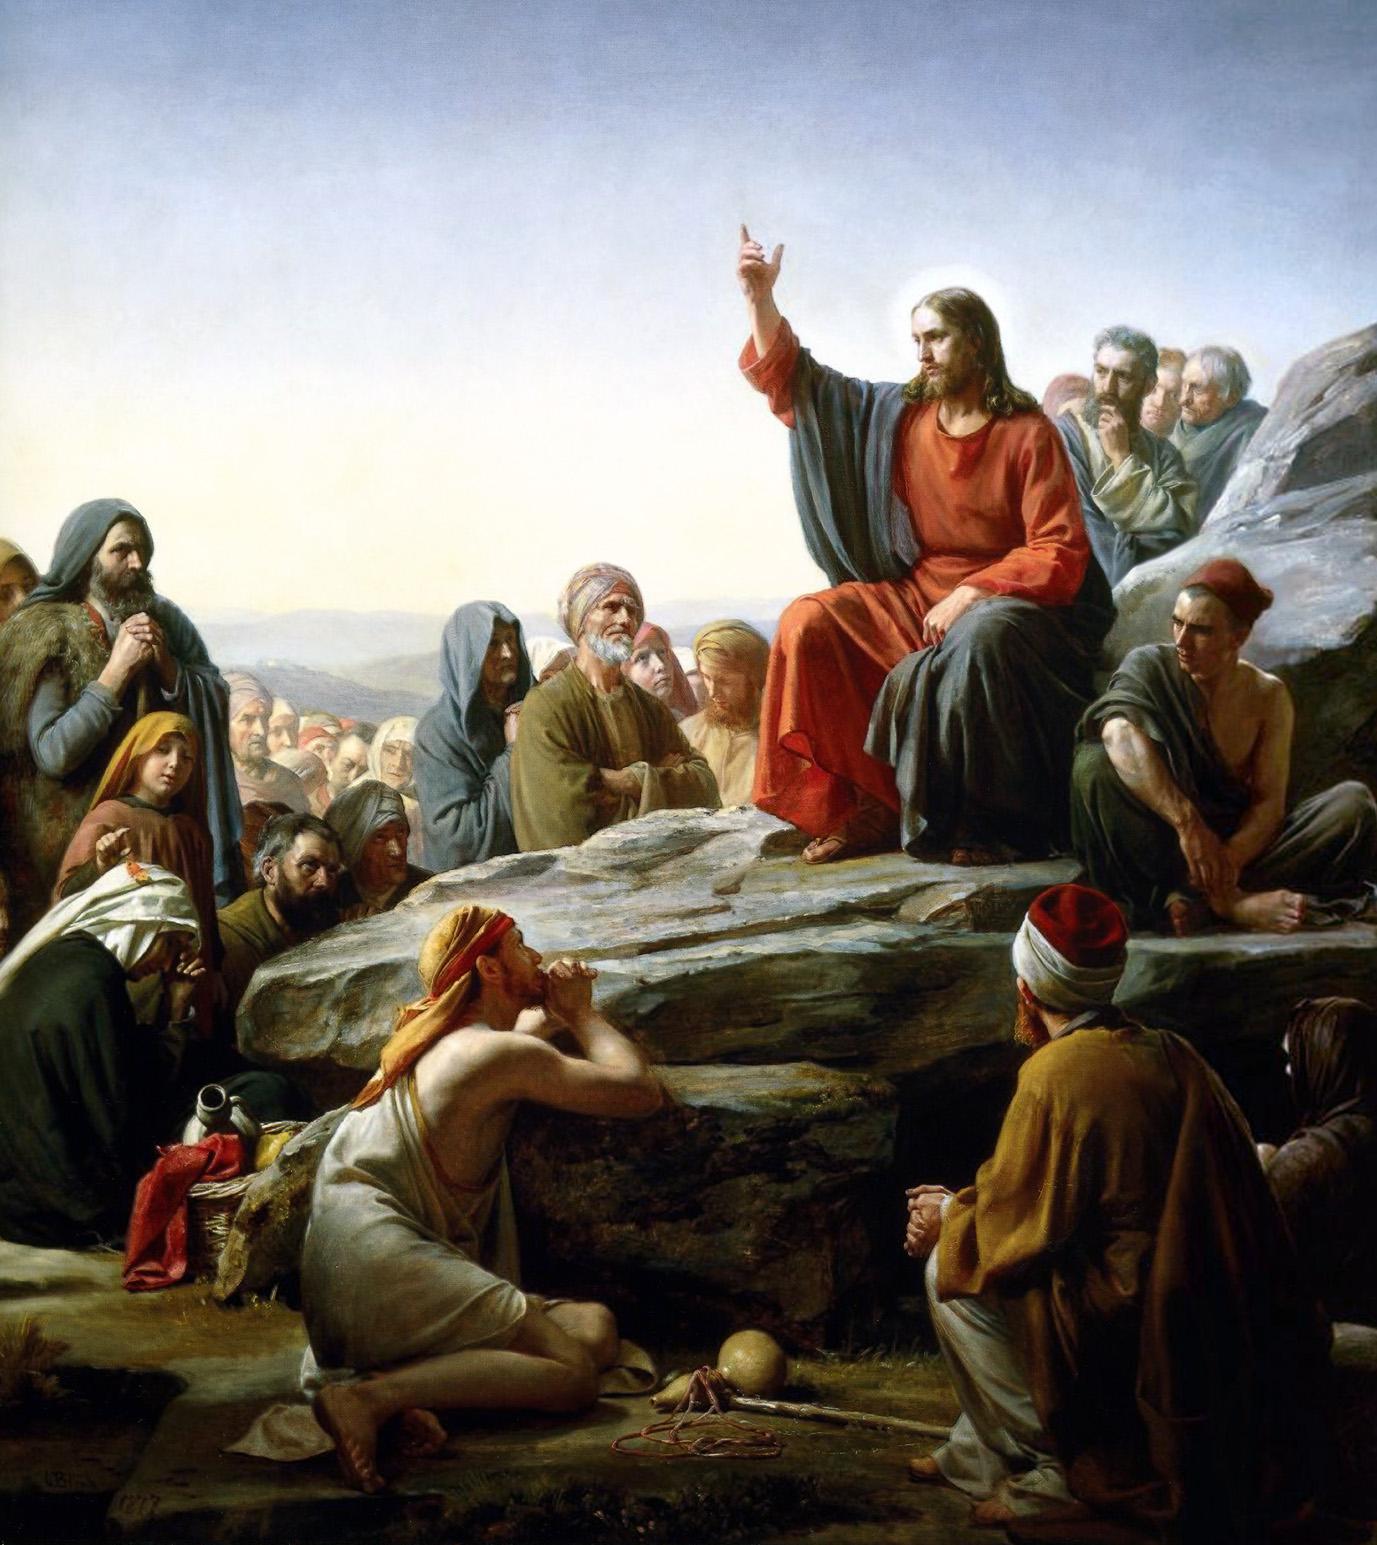 Matthew 5:1-12